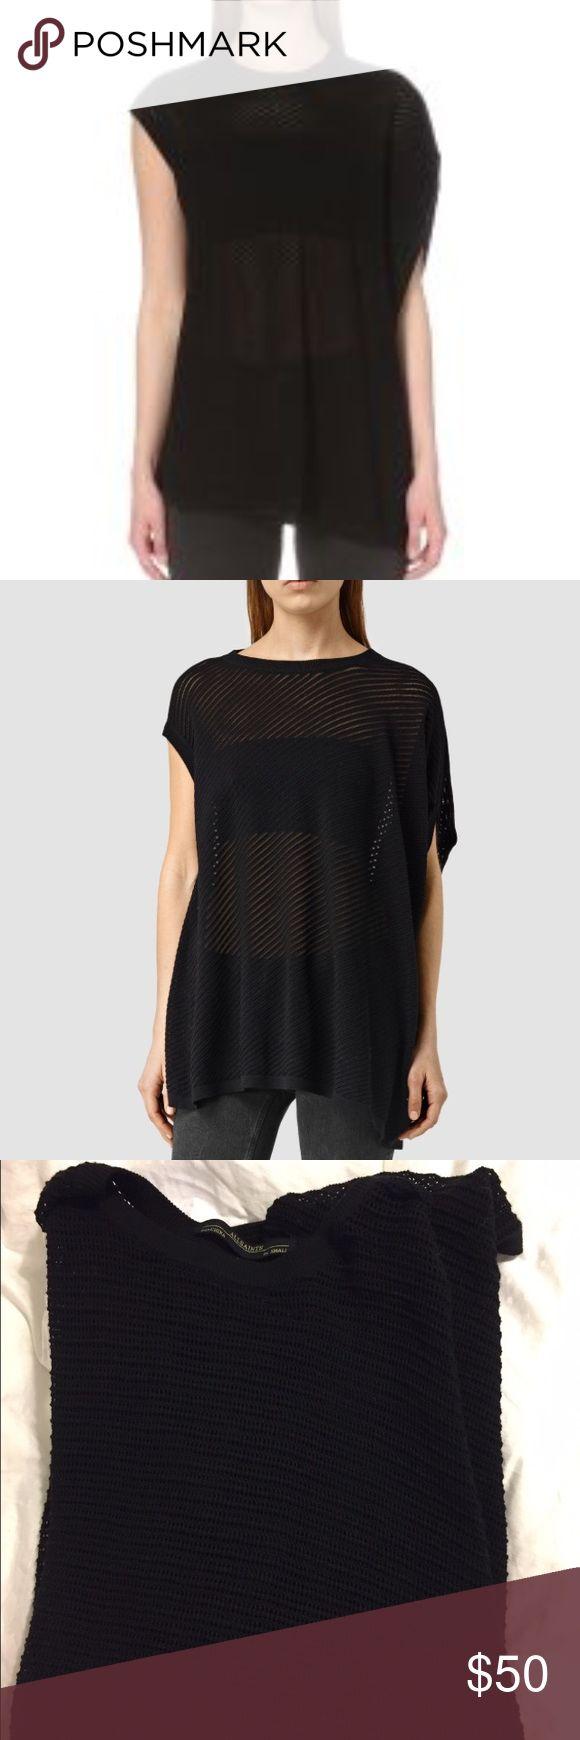 Allsaints Grid tee Black Asymmetrical black tee, sheer, ribbed texture. Great over leggings All Saints Tops Tees - Short Sleeve